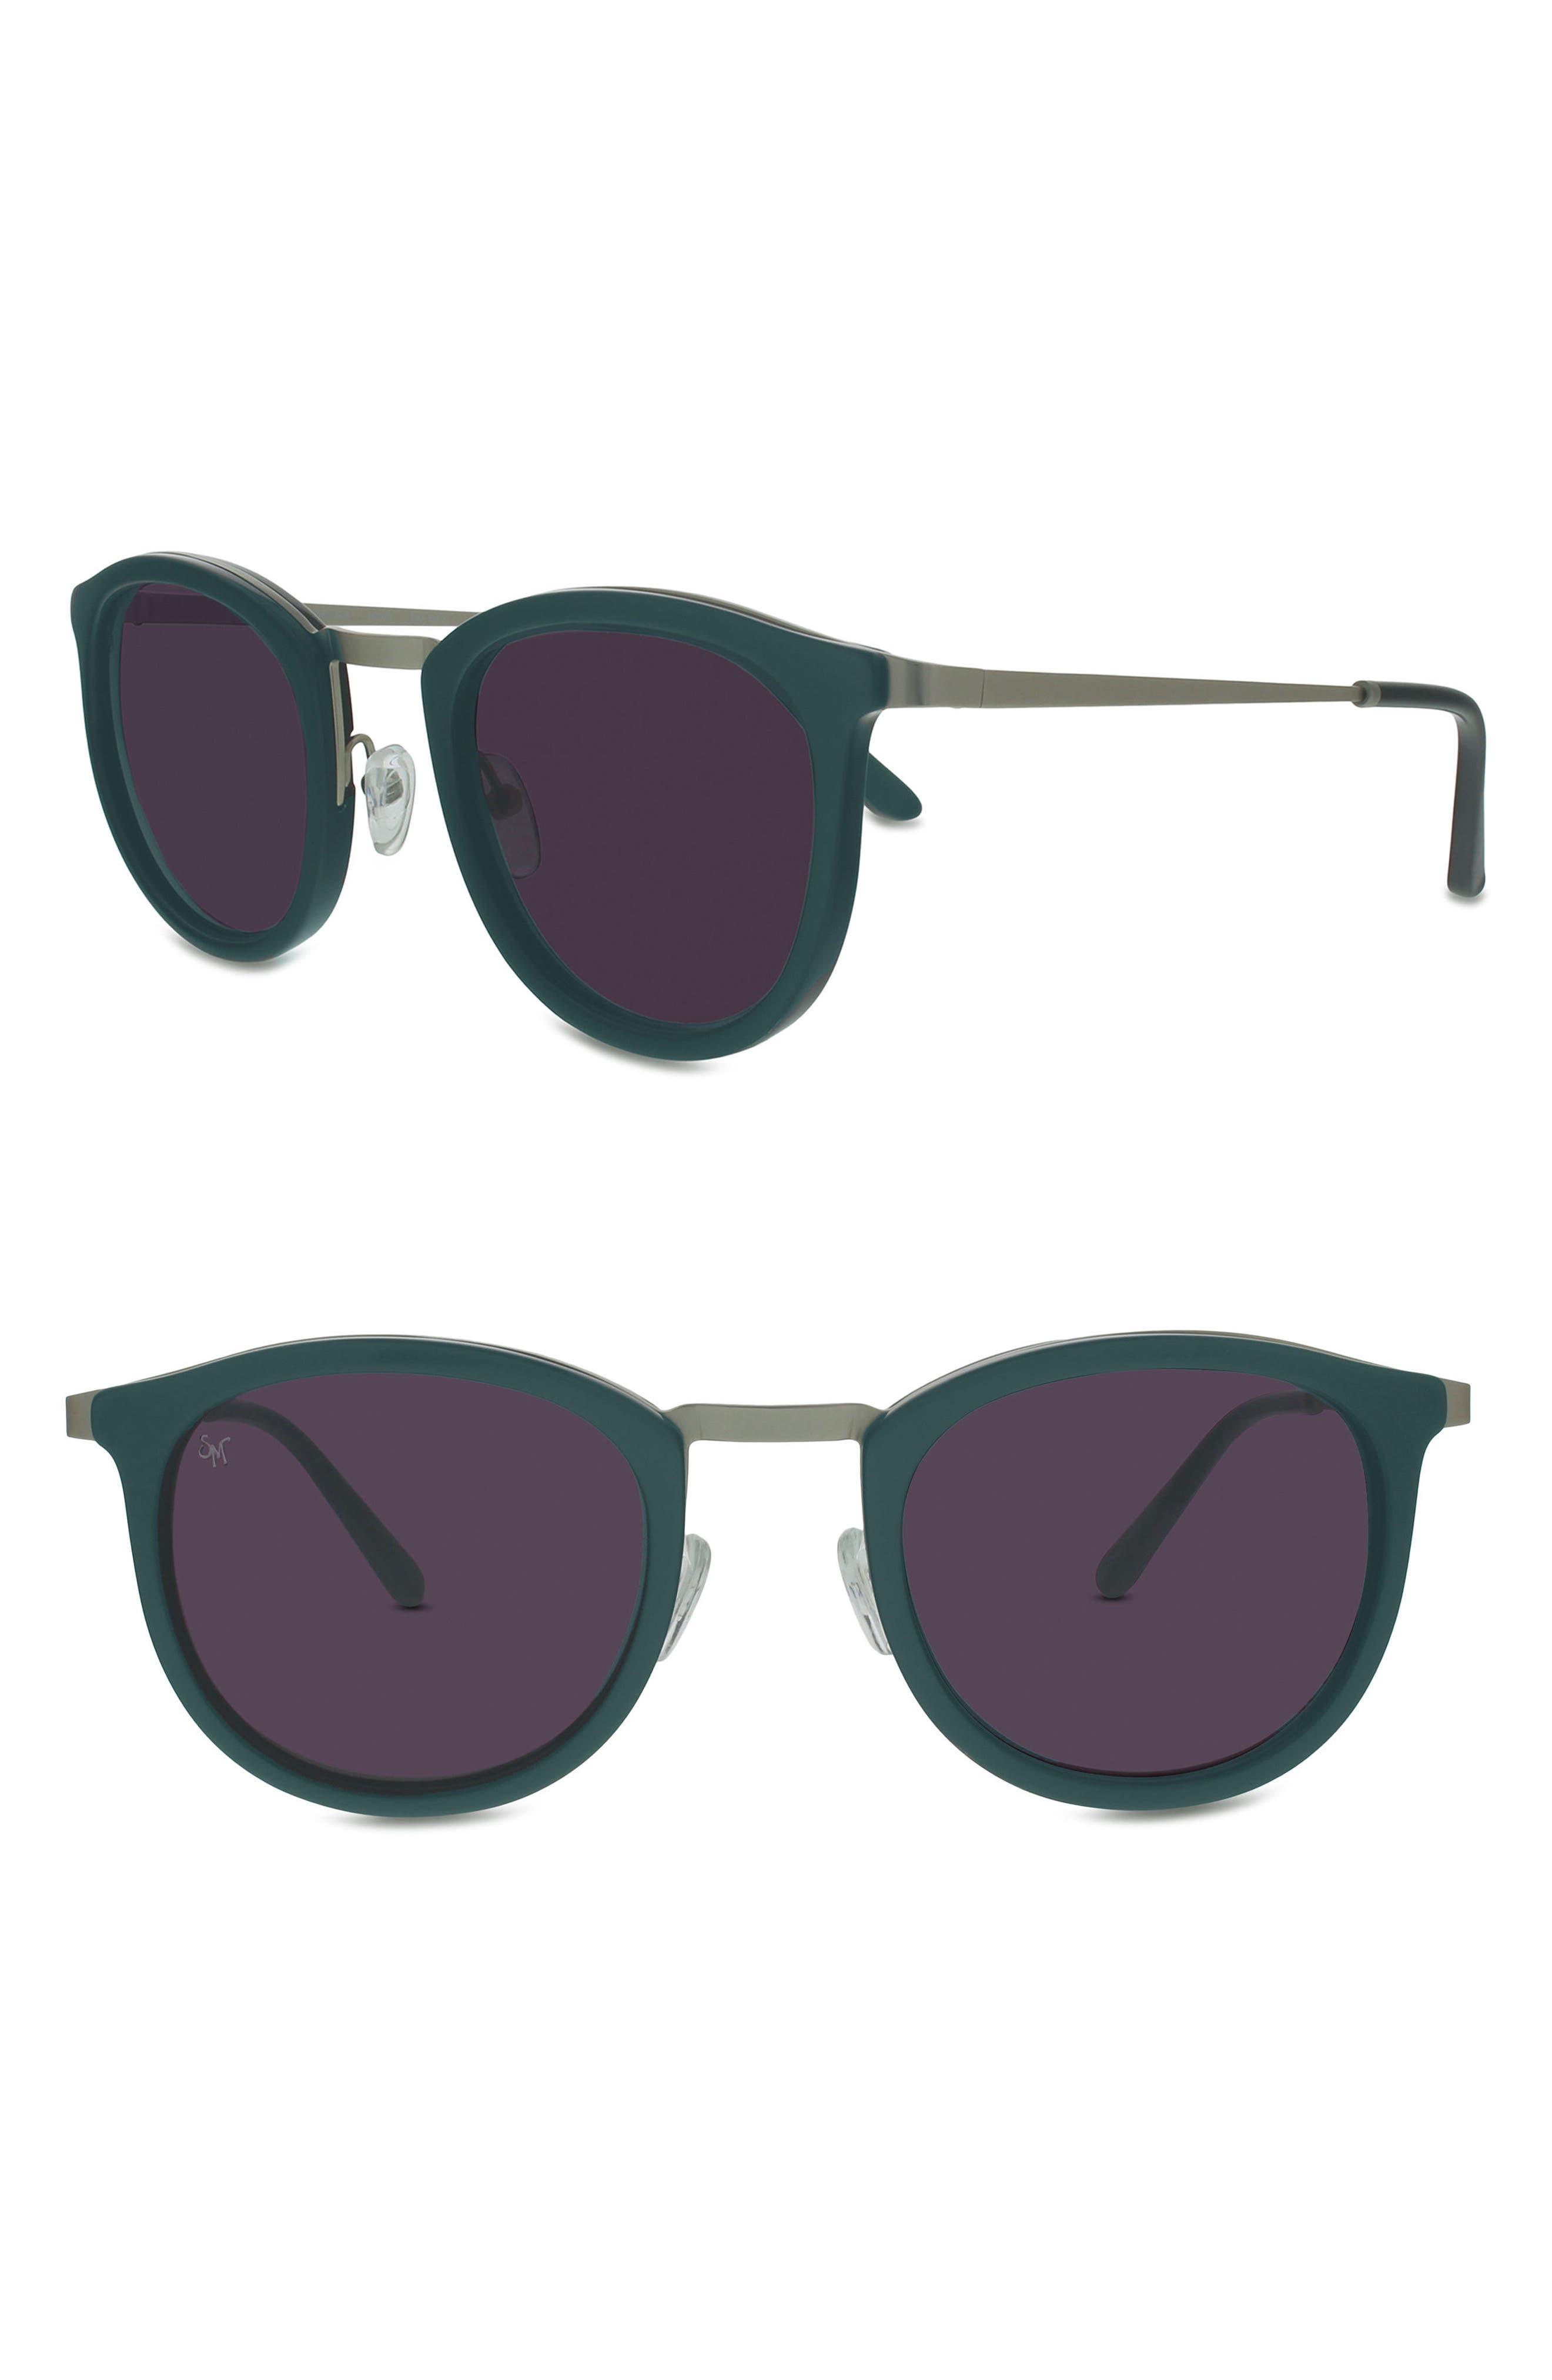 Shout 49mm Retro Sunglasses,                             Main thumbnail 1, color,                             GREEN/ MATTE SILVER